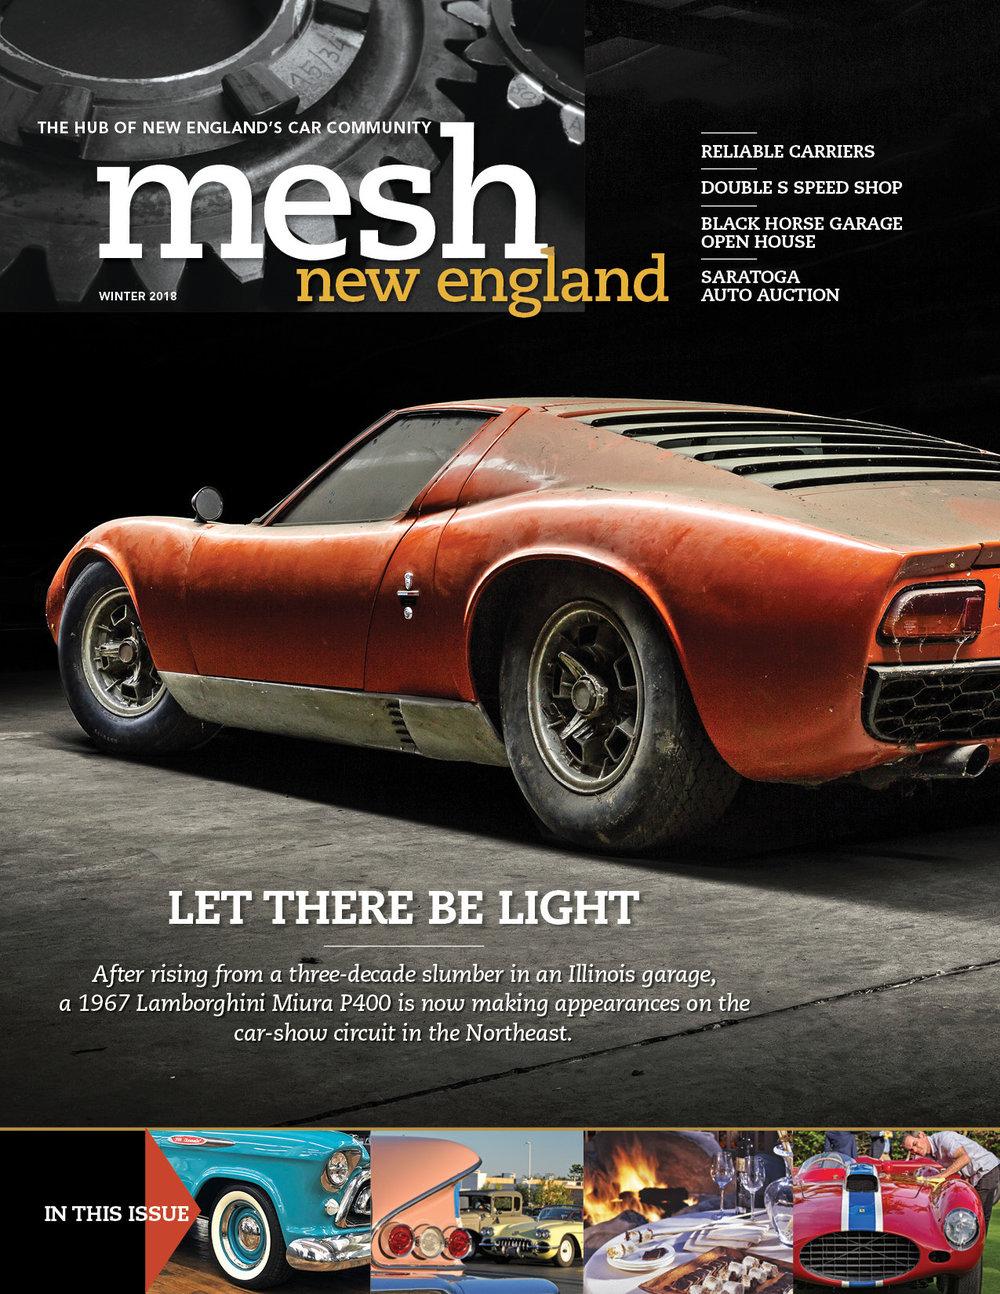 Winter 2018 Cover of Mesh New England Magazine. Red 1967 Lamborghini Miura on cover.jpg